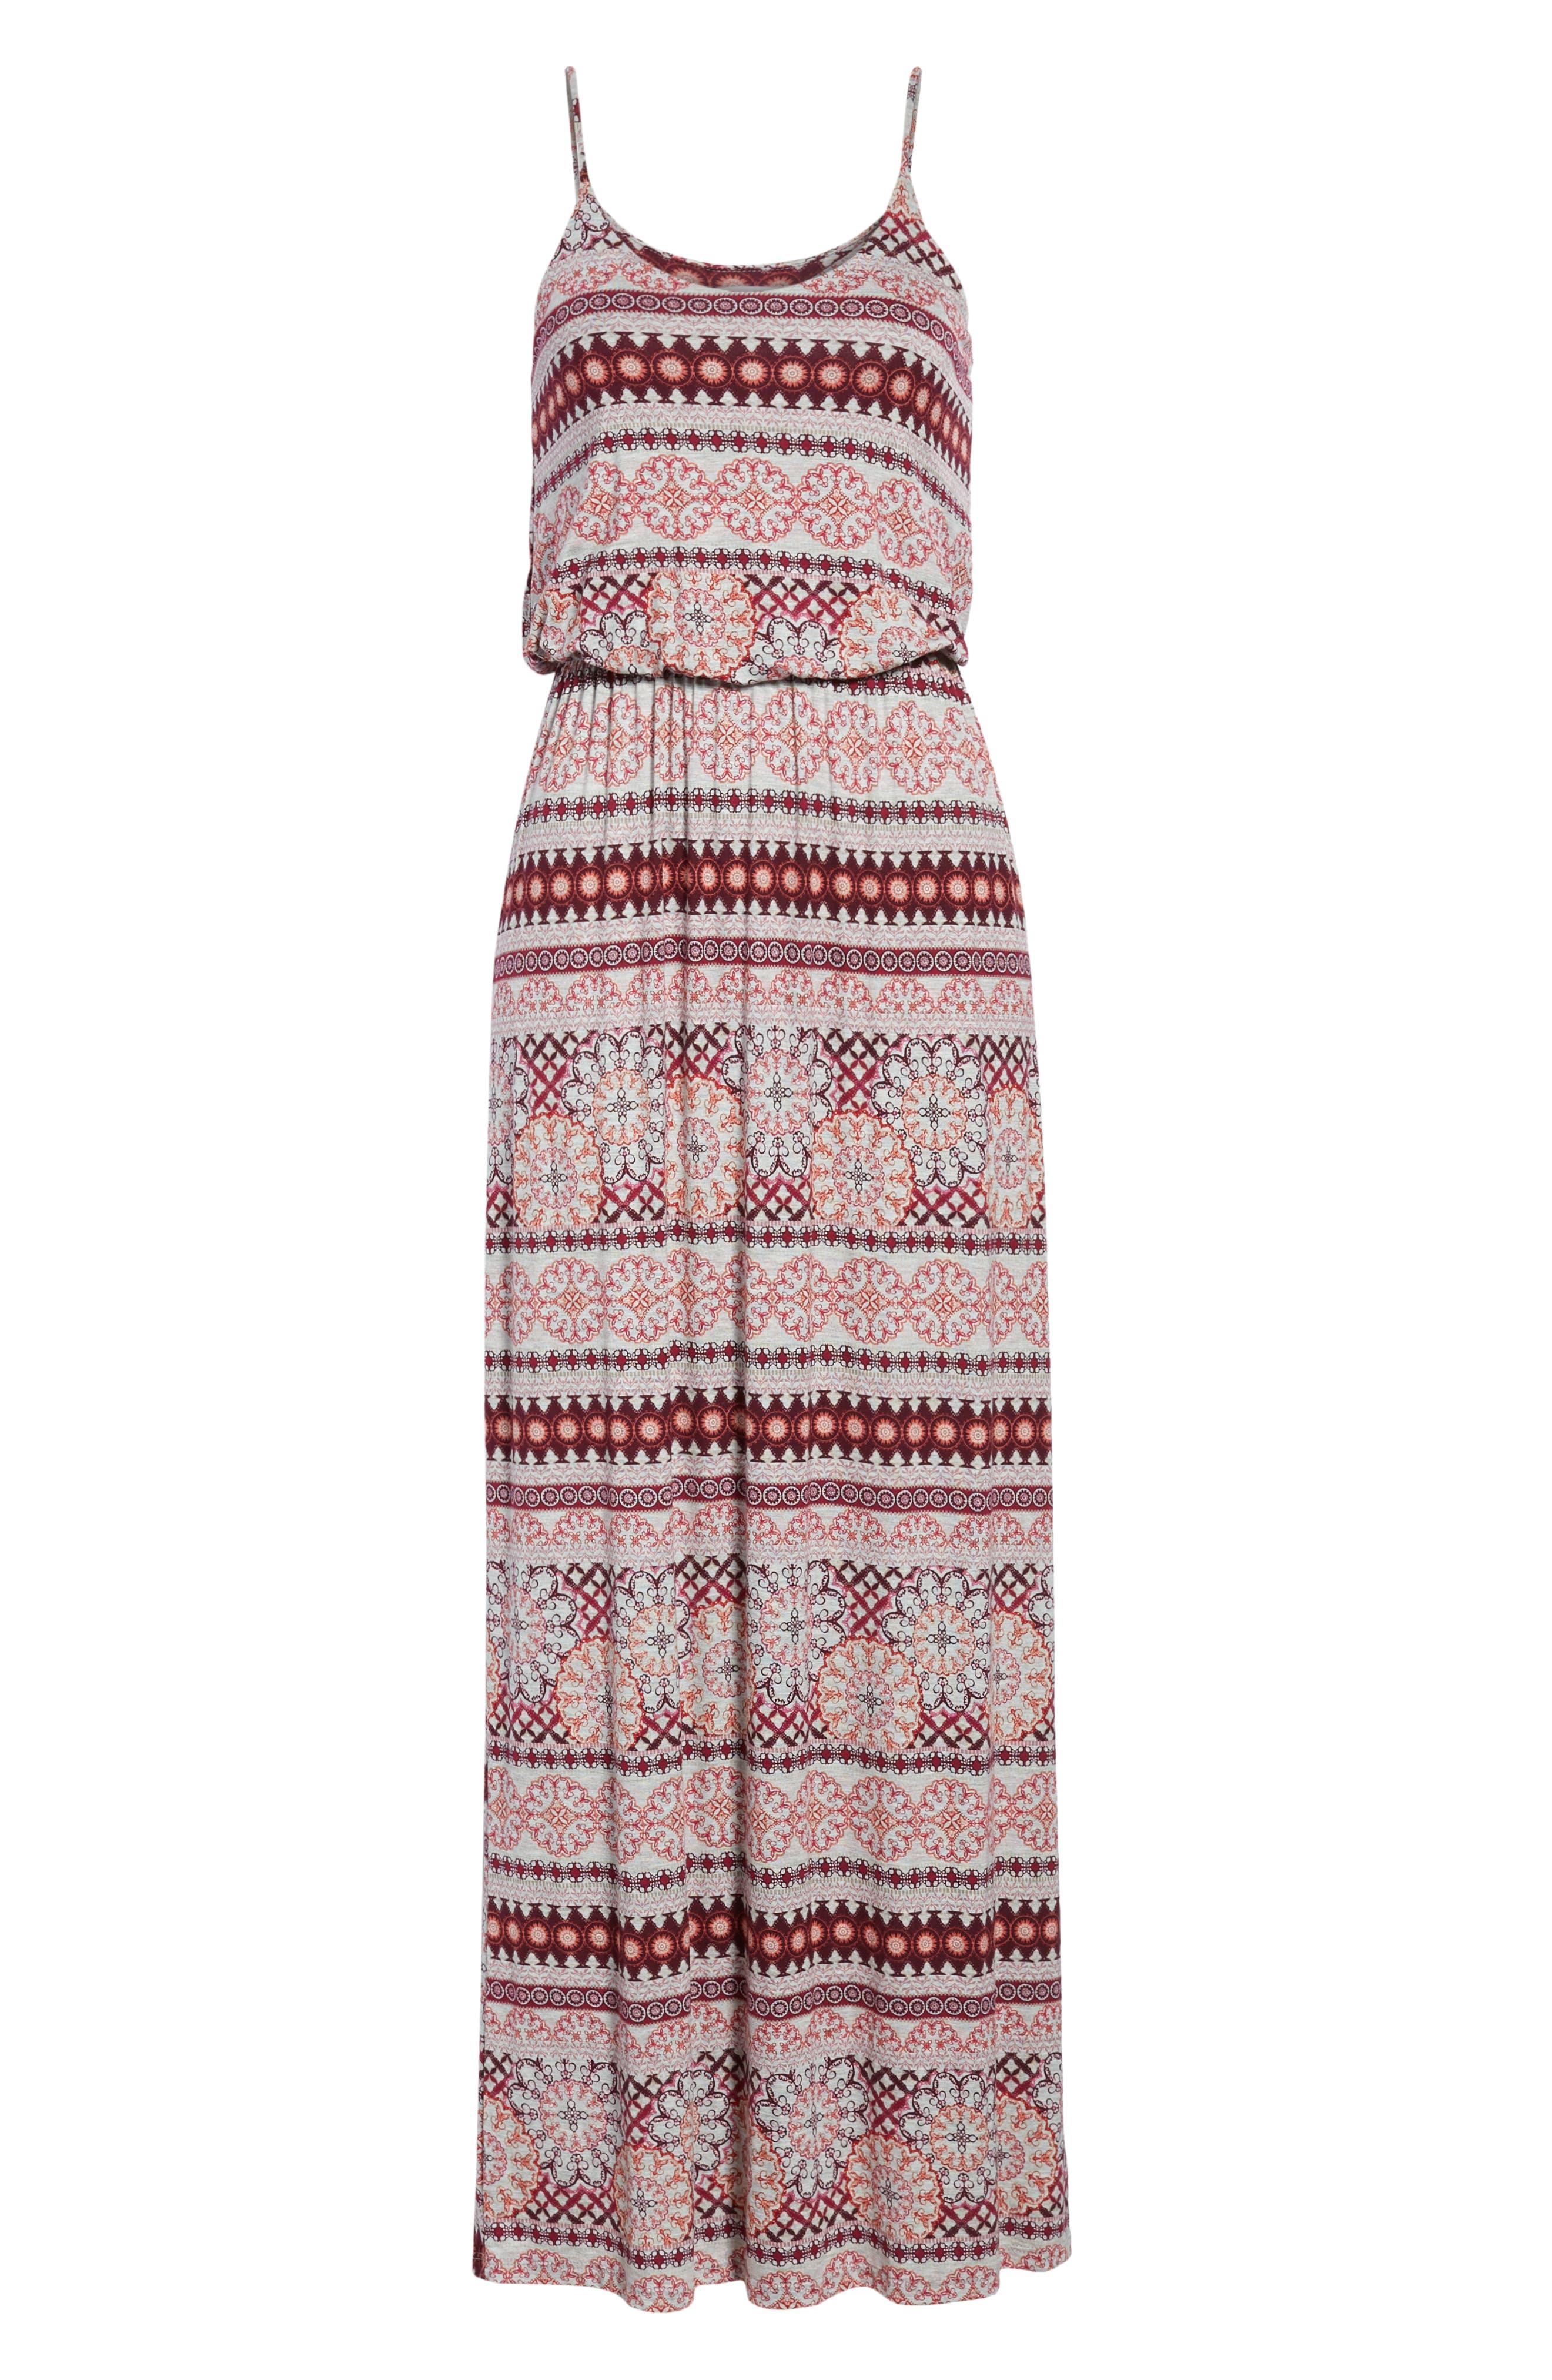 Knit Maxi Dress,                             Alternate thumbnail 7, color,                             HEATHERGREY/ CORAL